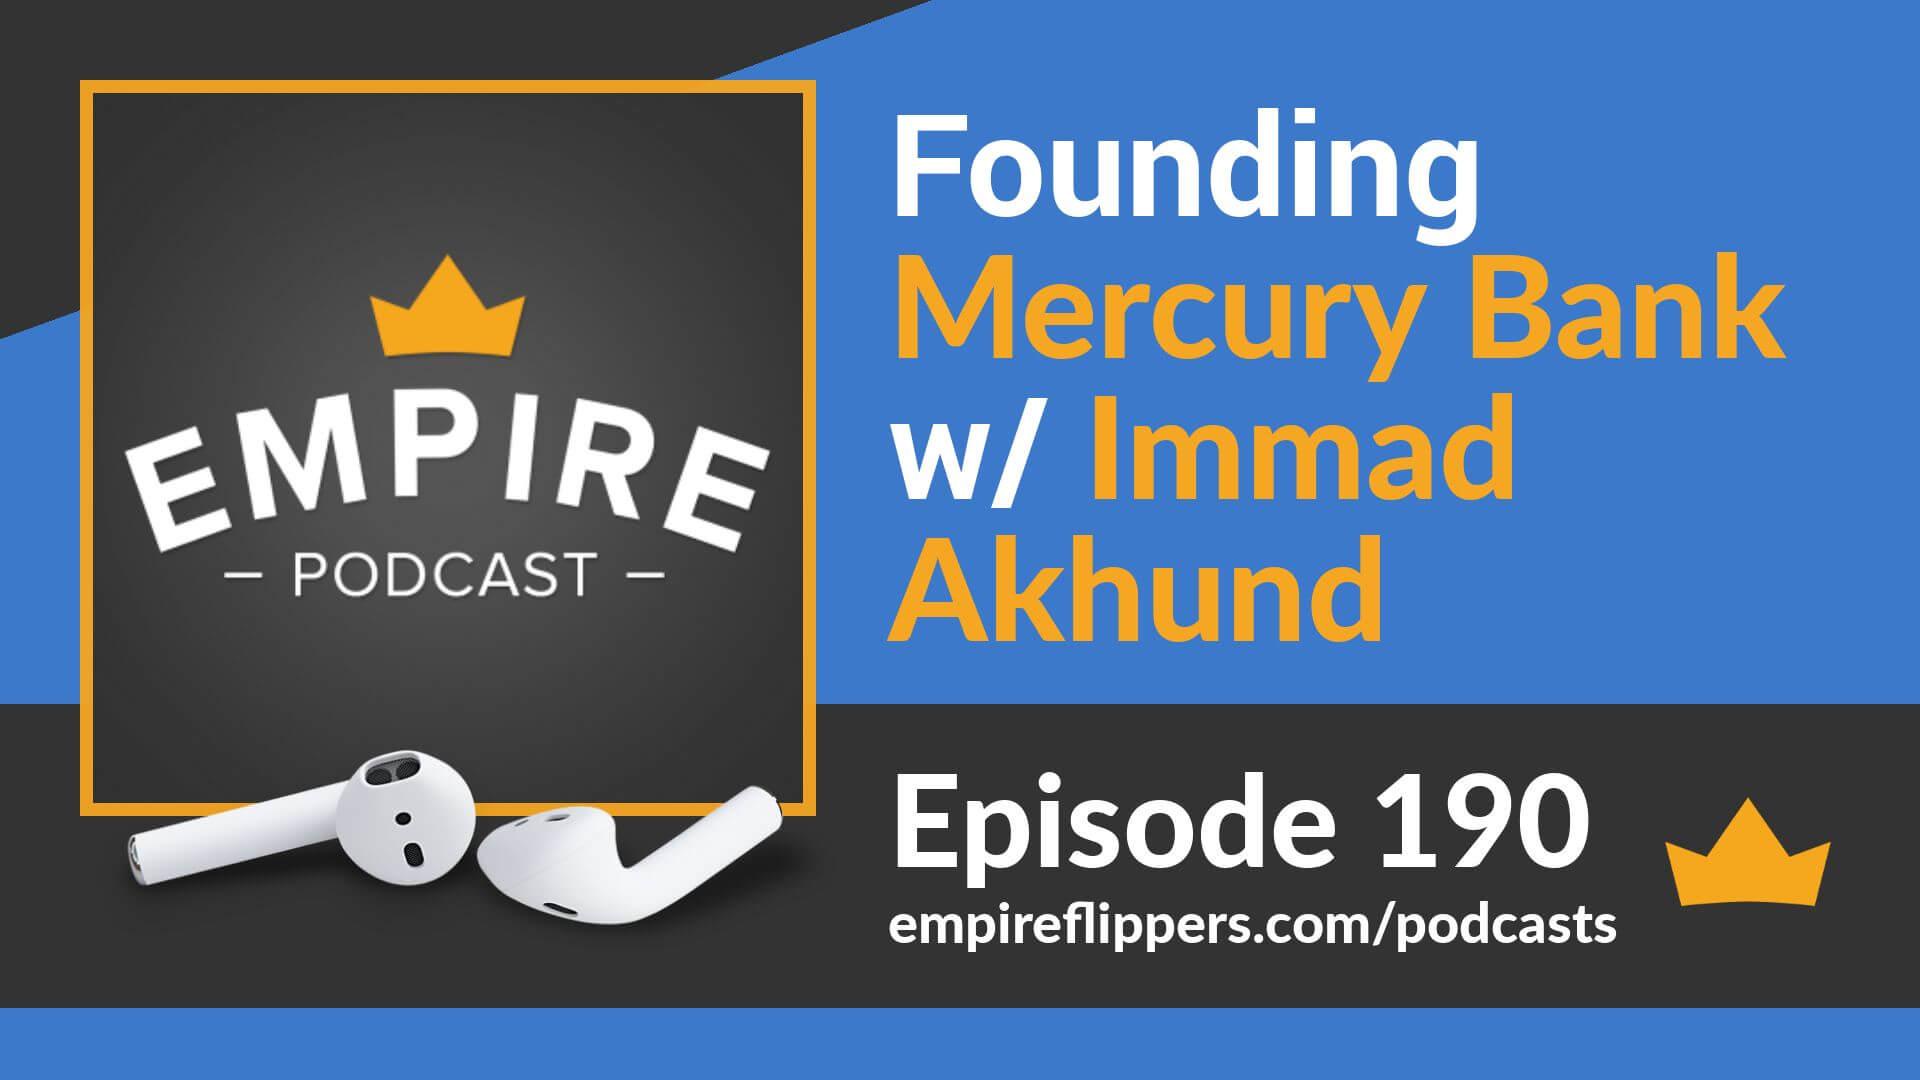 EFP 190 - Founding Mercury Bank with Immad Akhund